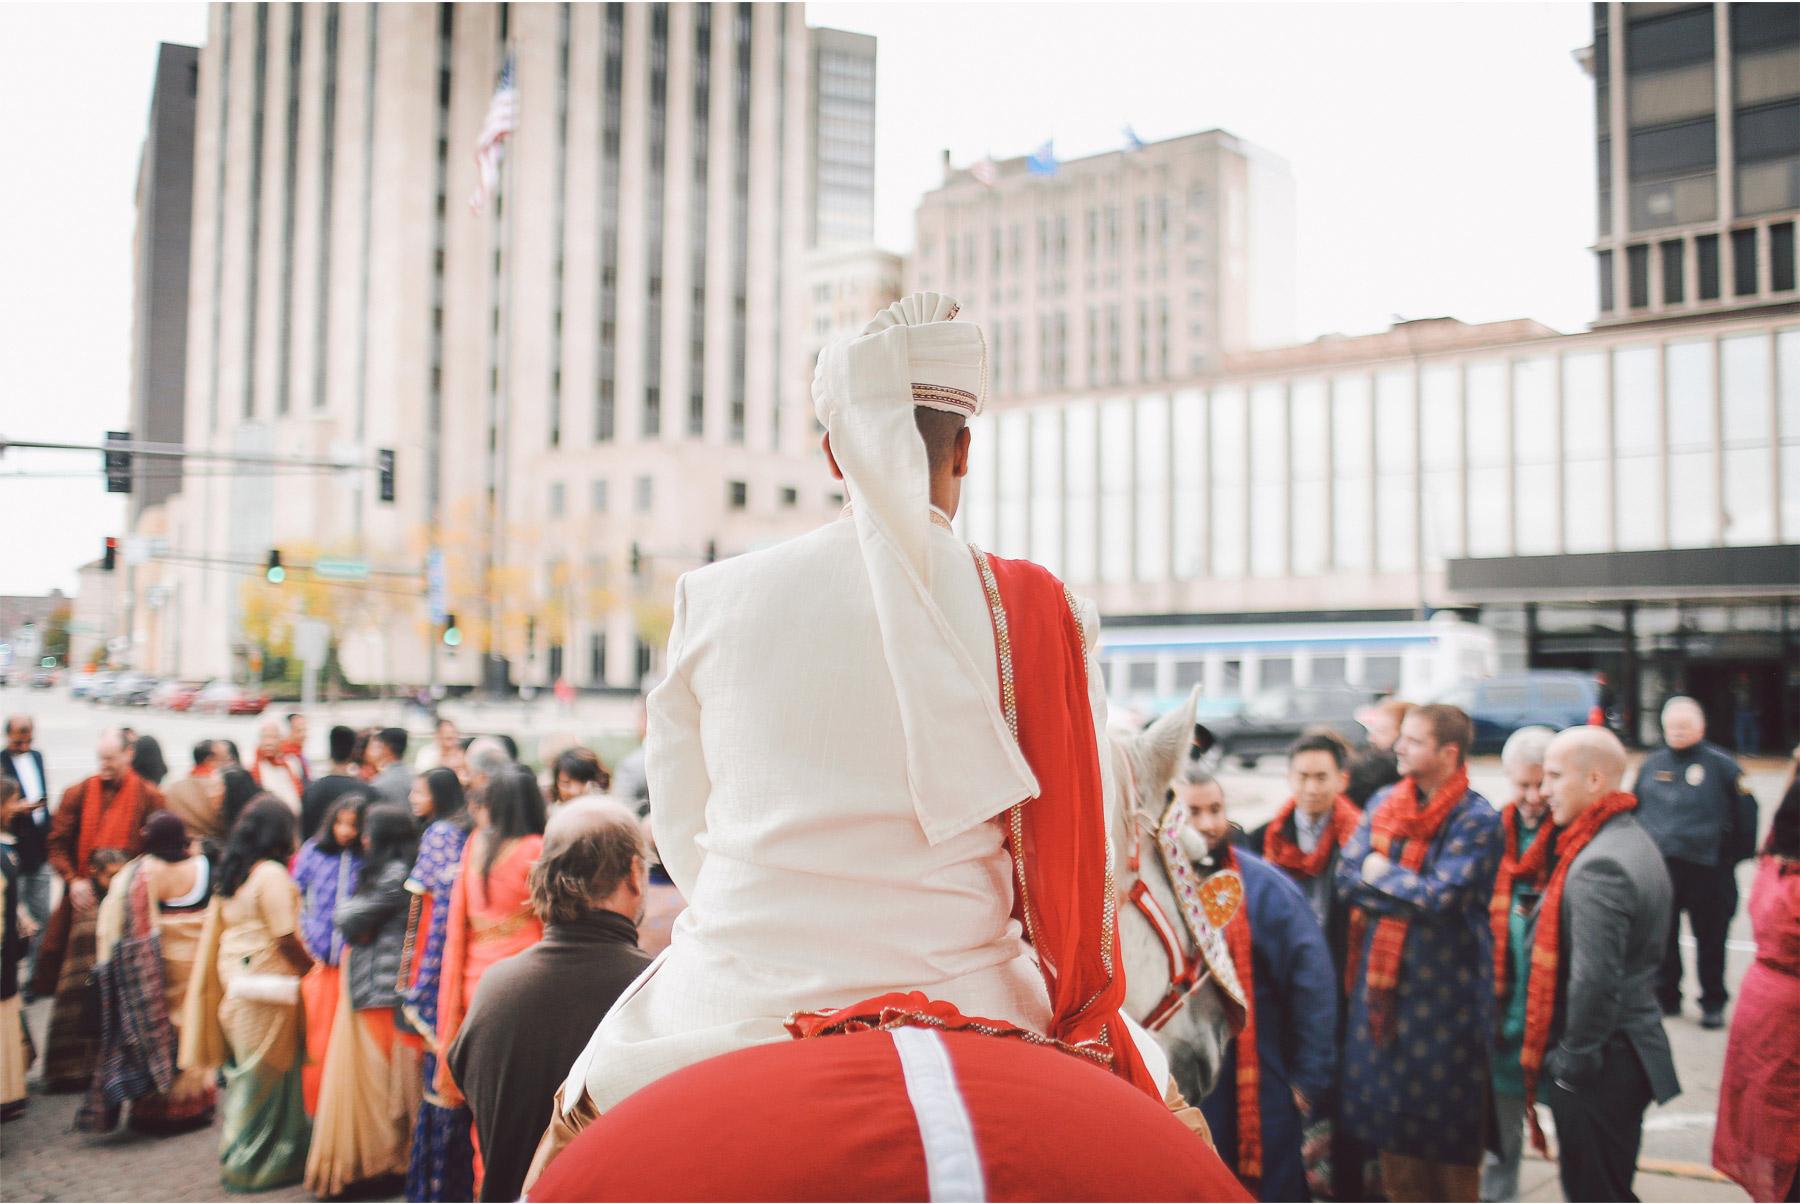 02-St-Paul-Minnesota-Wedding-Photography-by-Vick-Photography-Intercontinental-St-Paul-Riverfront-Traditional-Indian-Wedding-Baraat-Horse-Groom-Leena-and-Michael.jpg